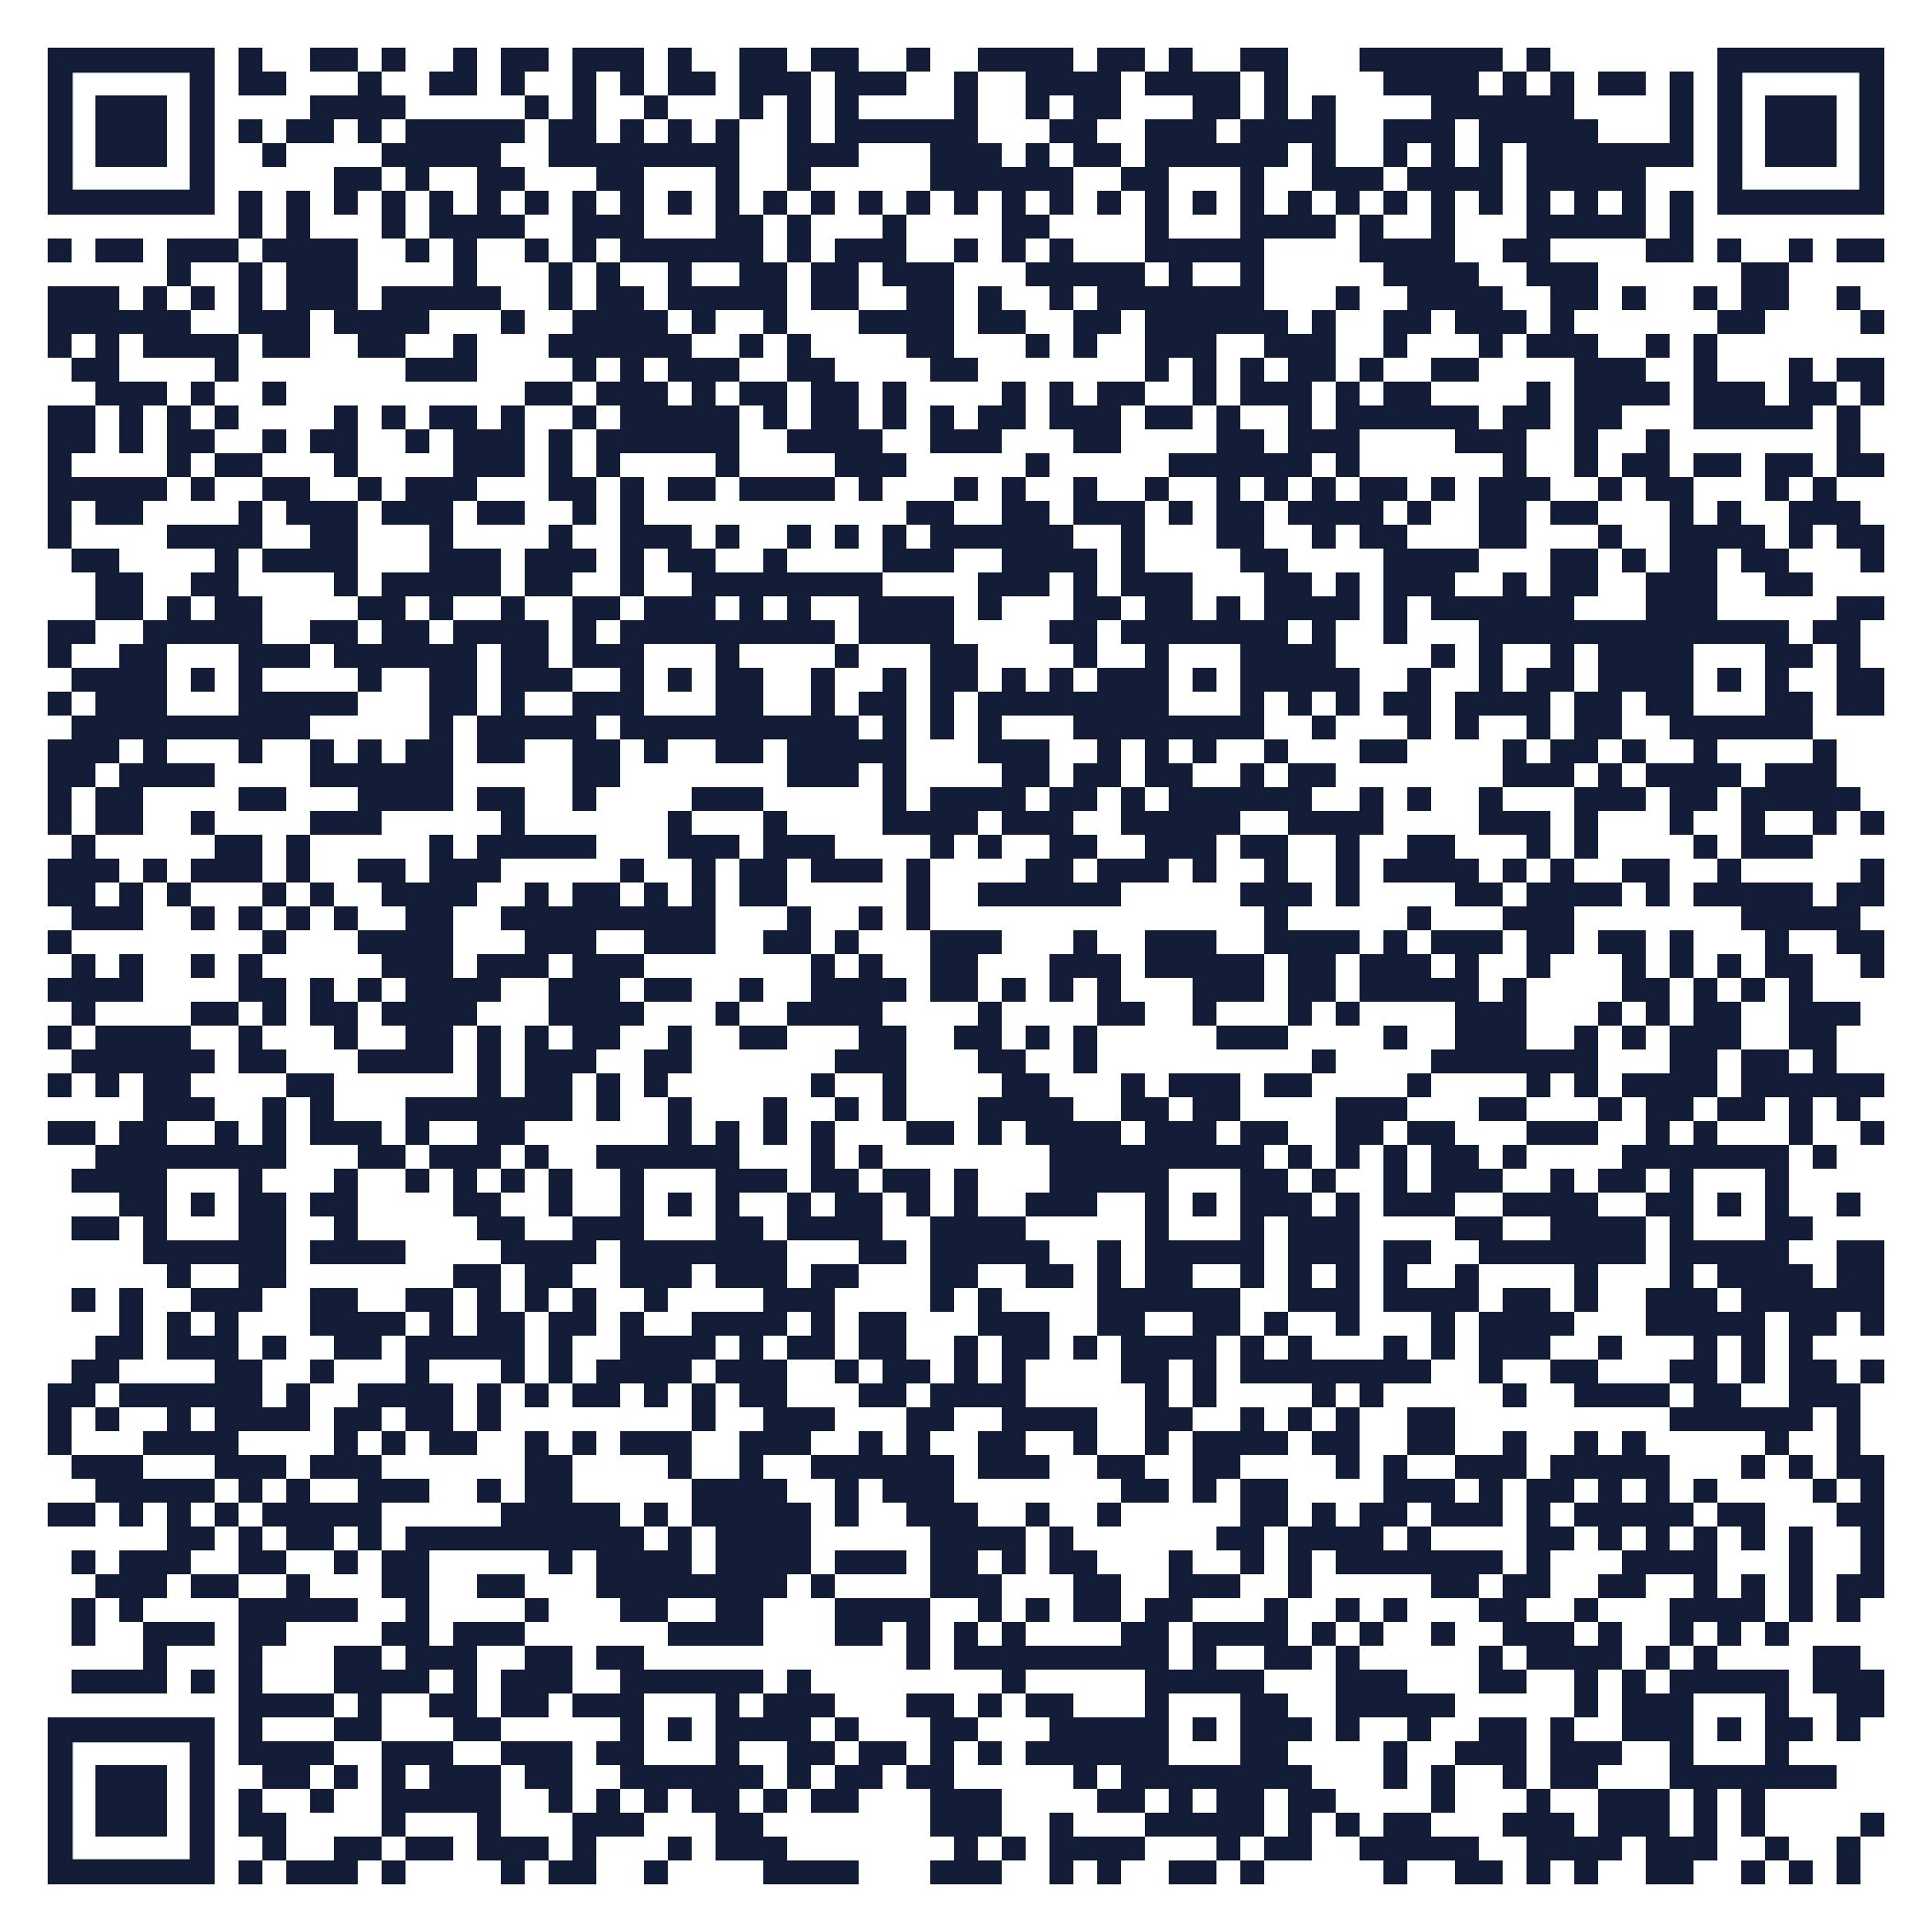 QR 코드 스캔